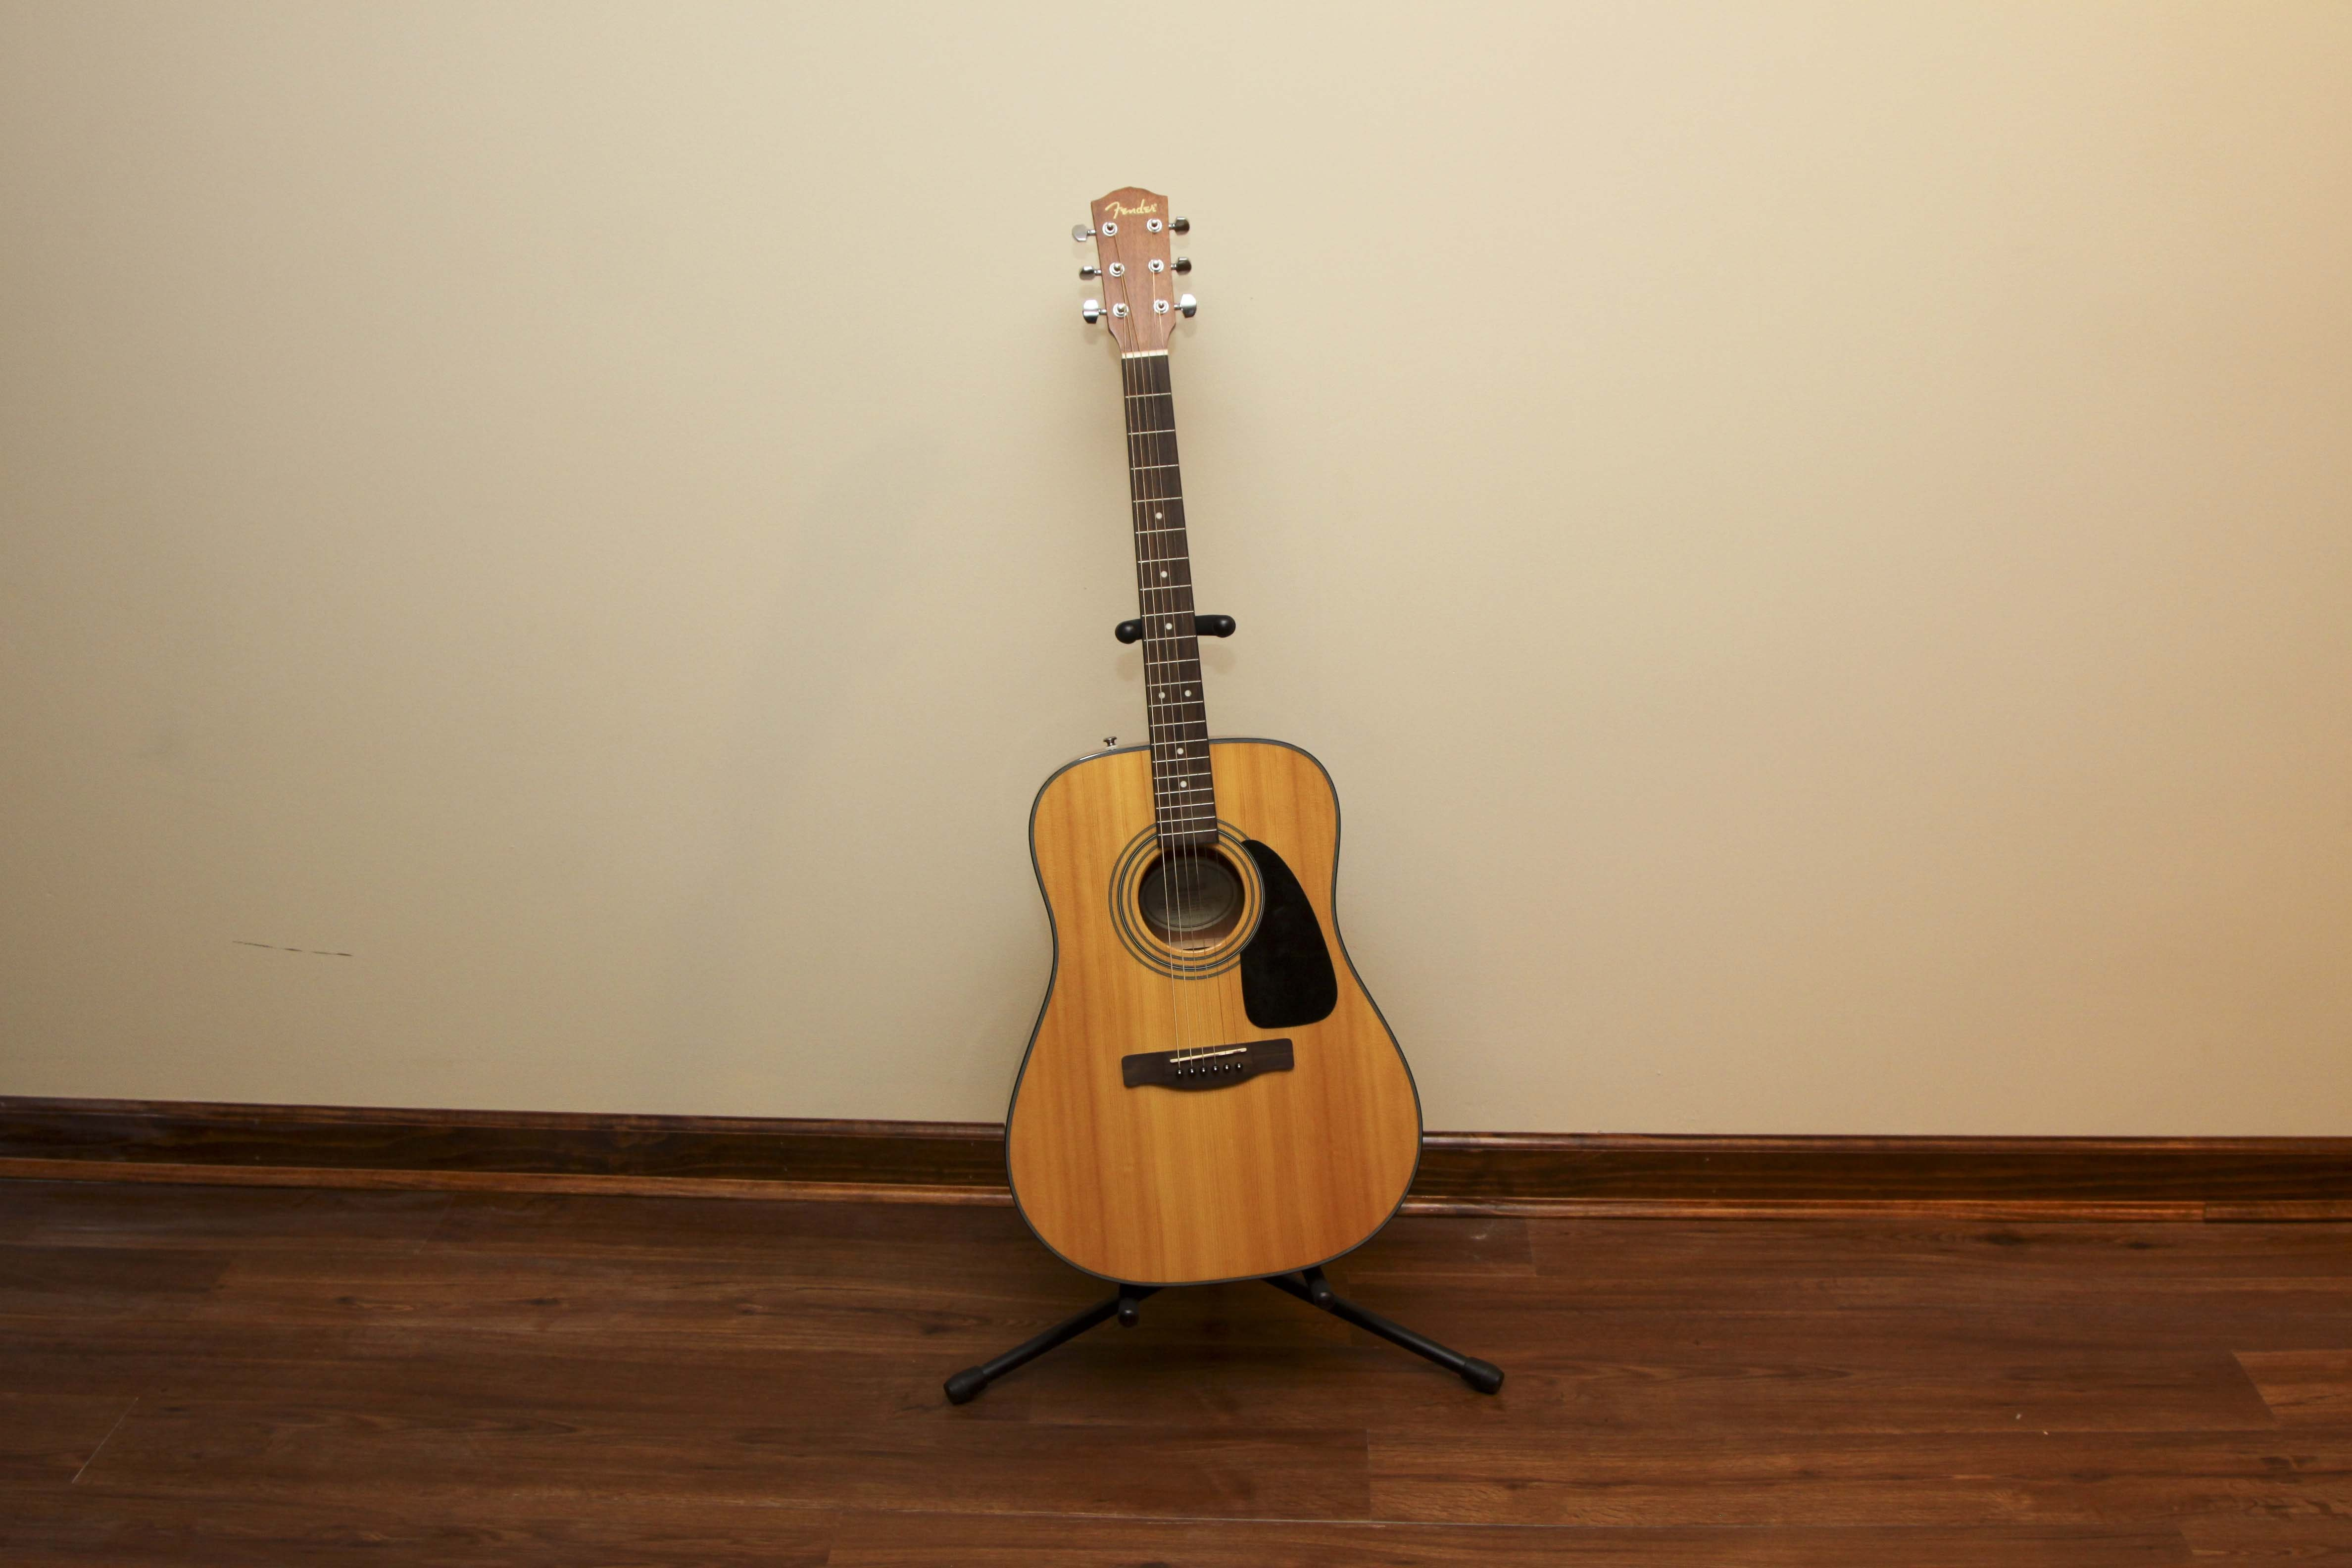 Fender DG-8S Six String Acoustic Guitar